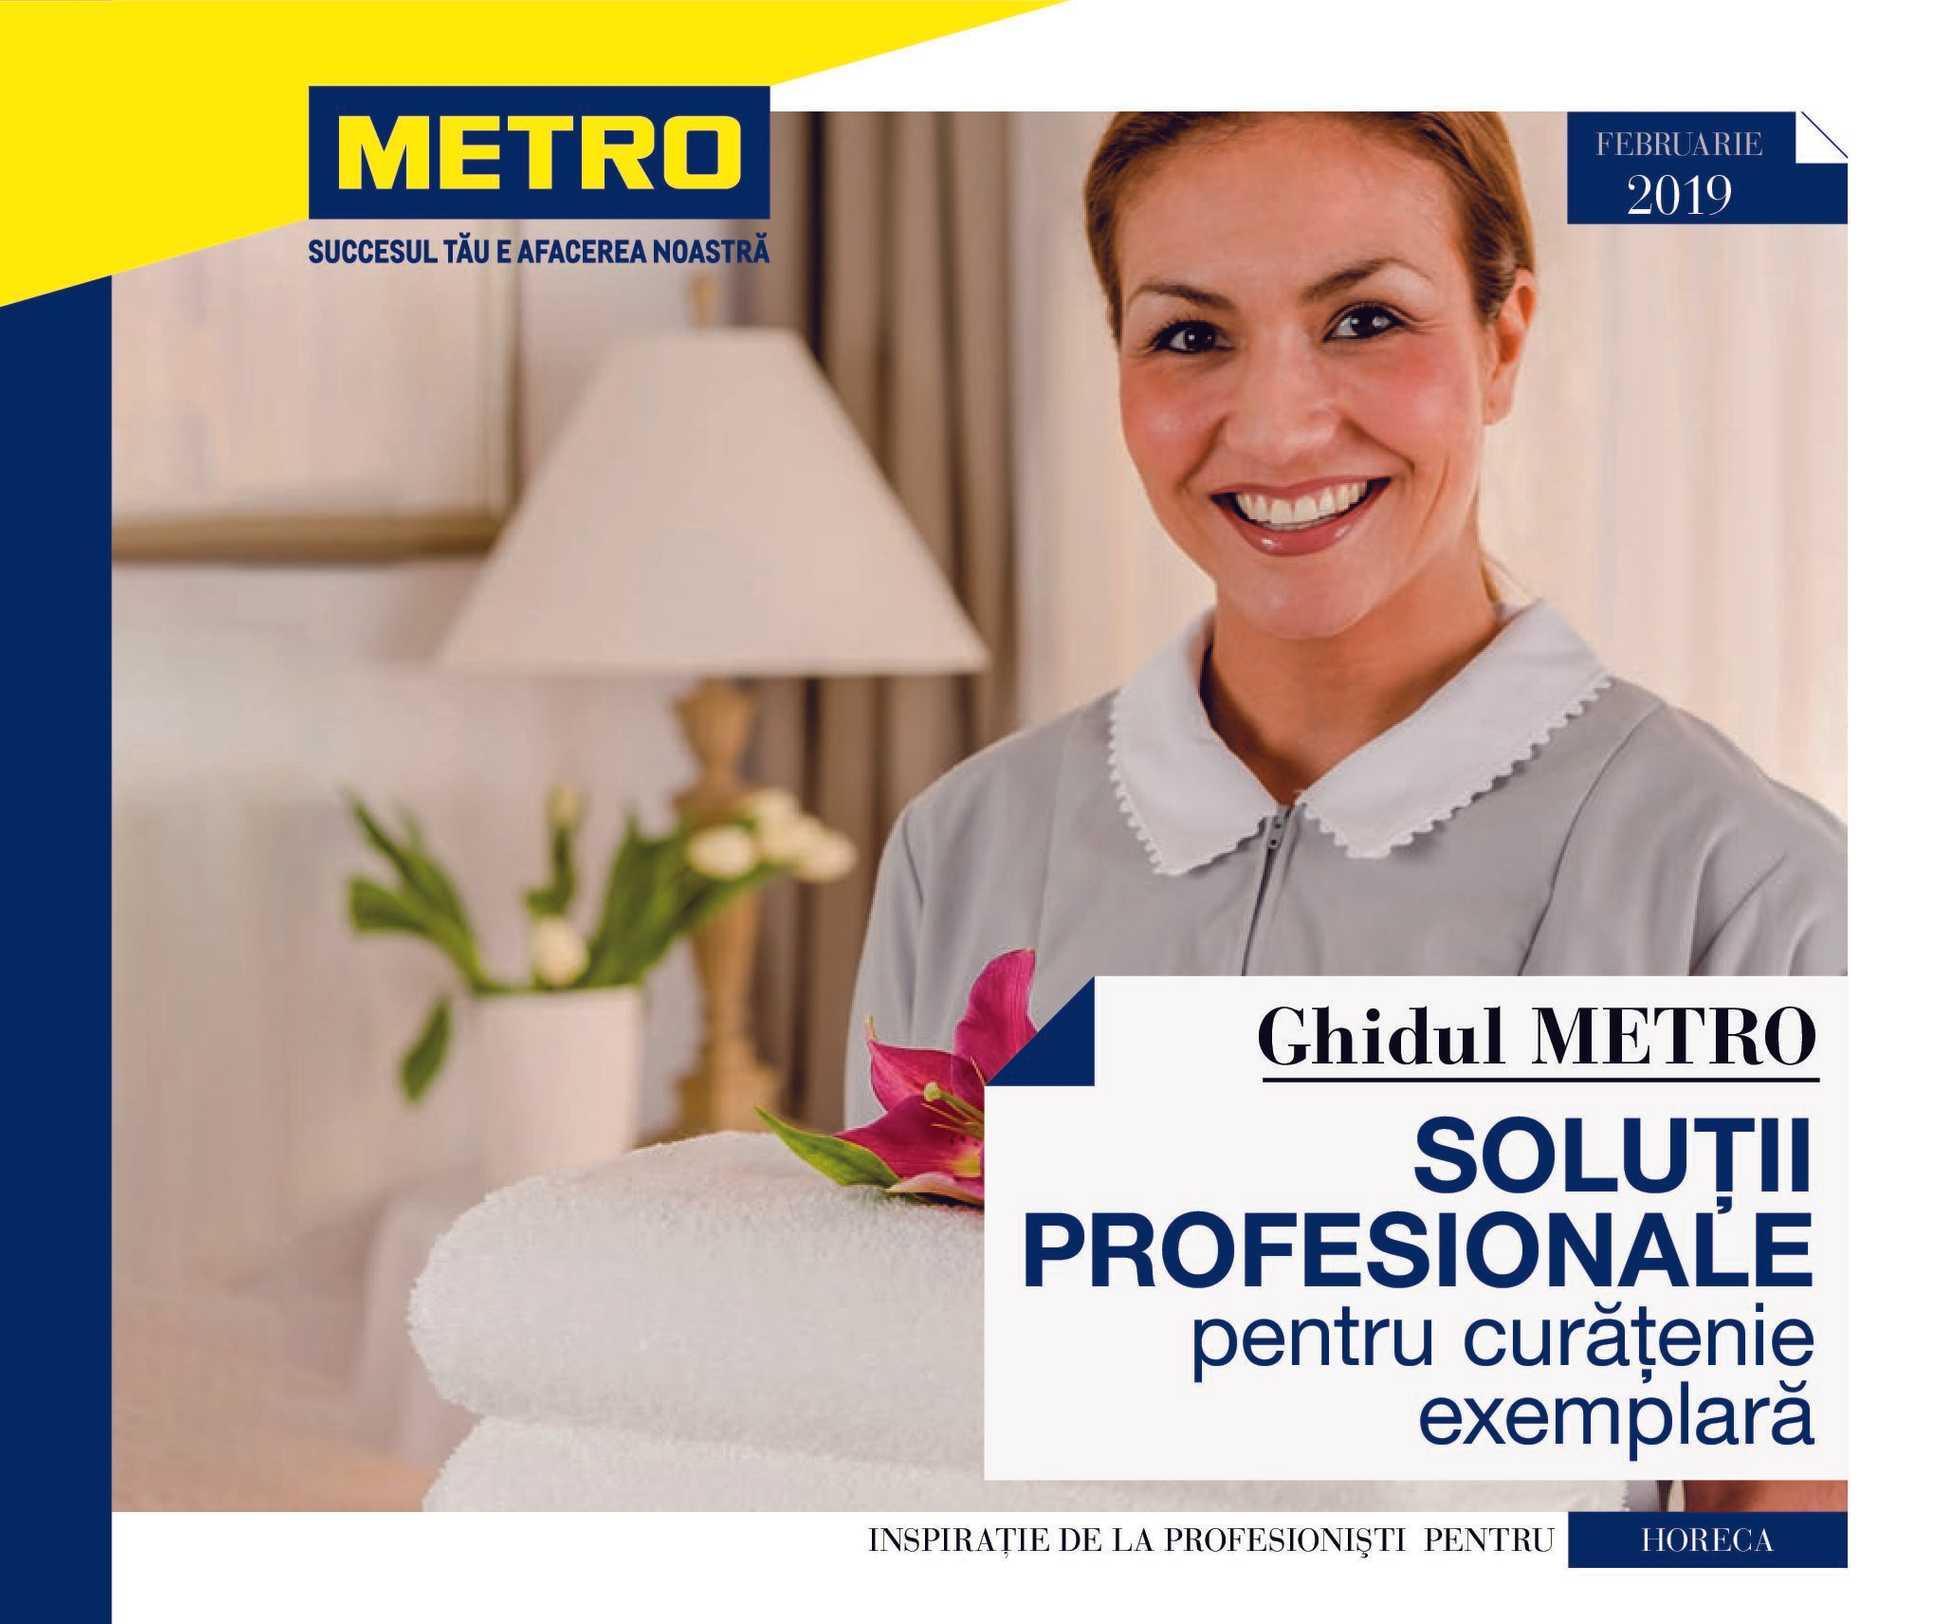 Metro - NEWSPAPERS_singleNewspaper_alt_presentationSliderItem_startAt 2019-02-01 - pagină 1